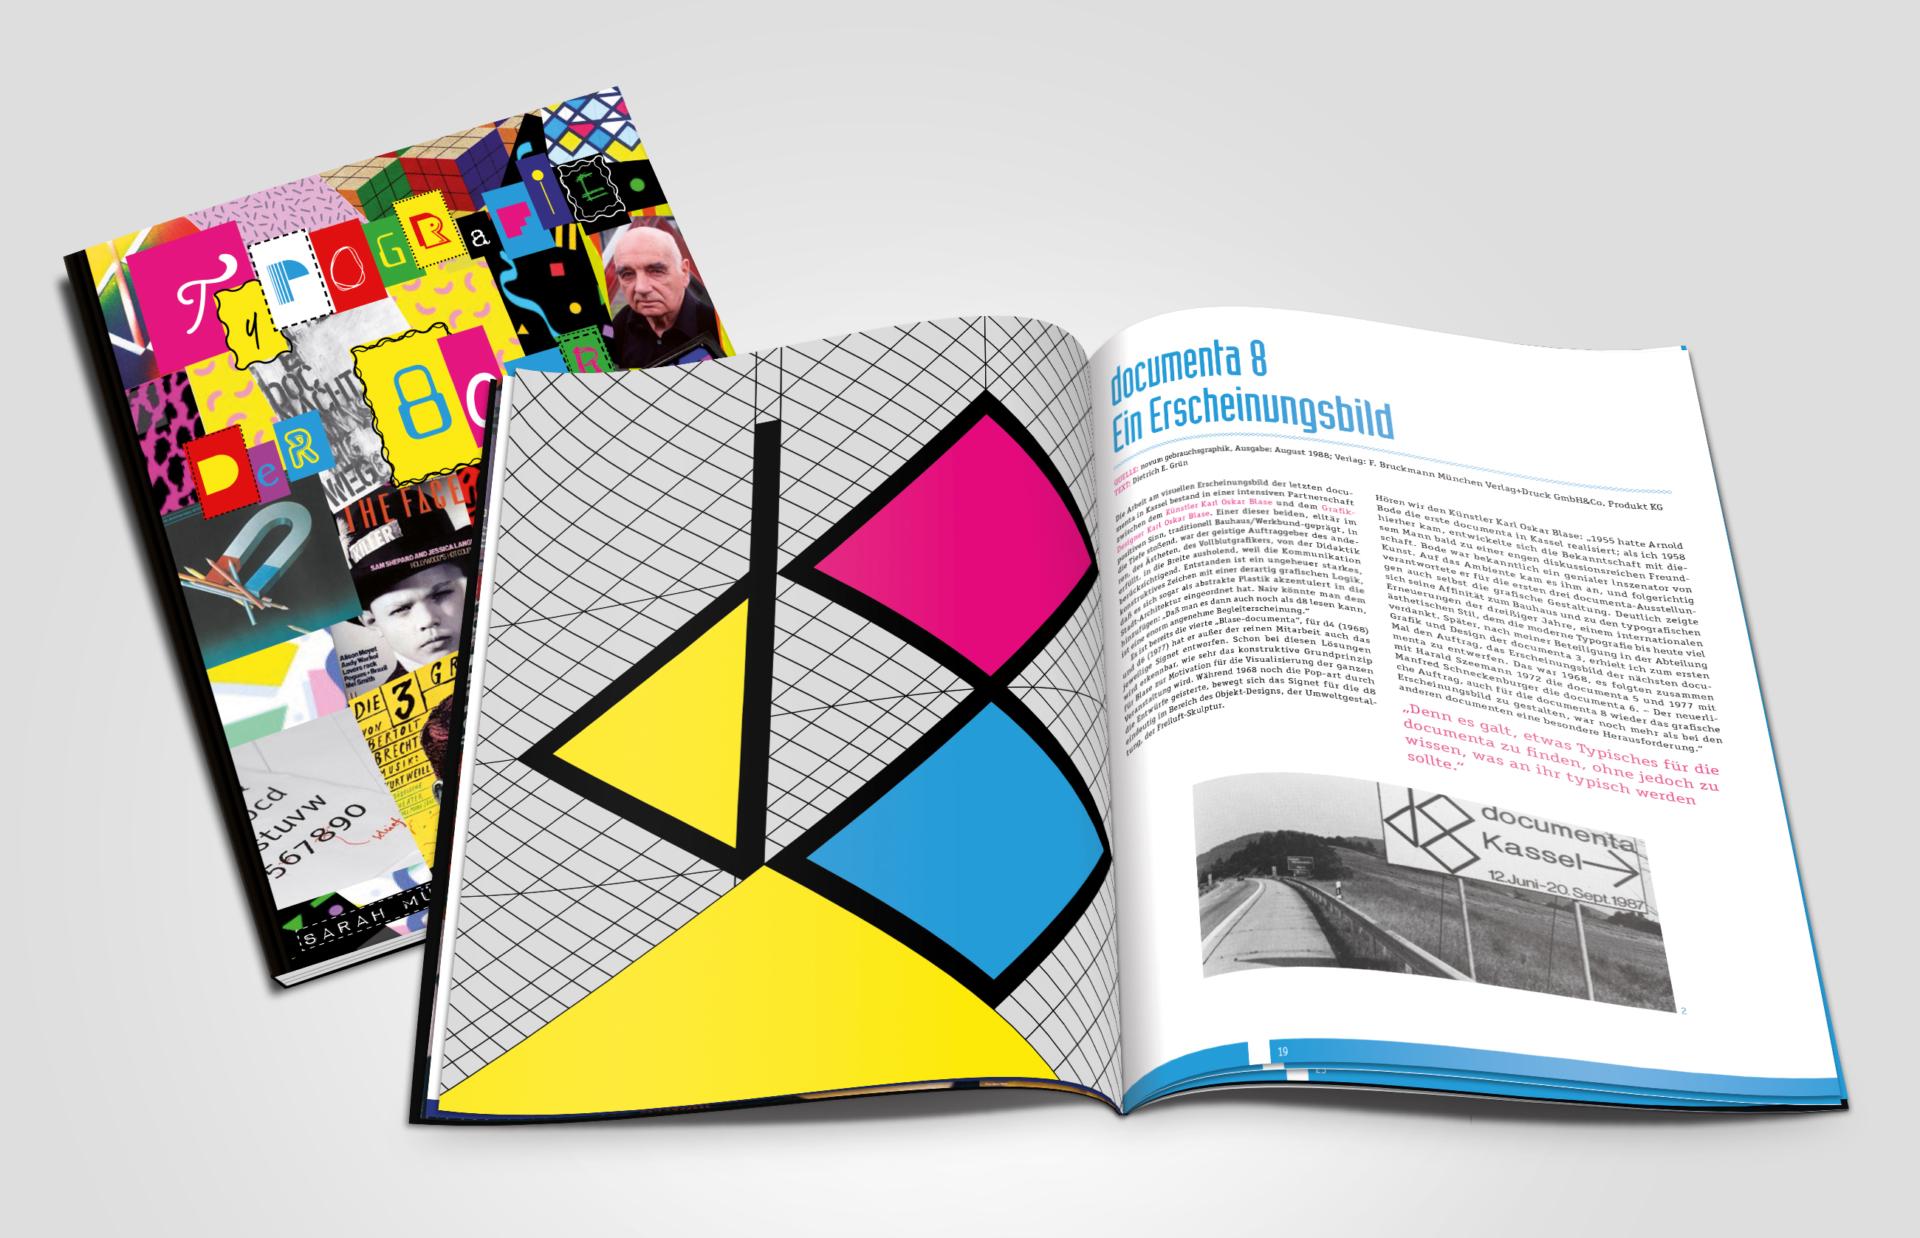 meandsarah – Grafikdesign Editorial: Typografie der 80er Jahre